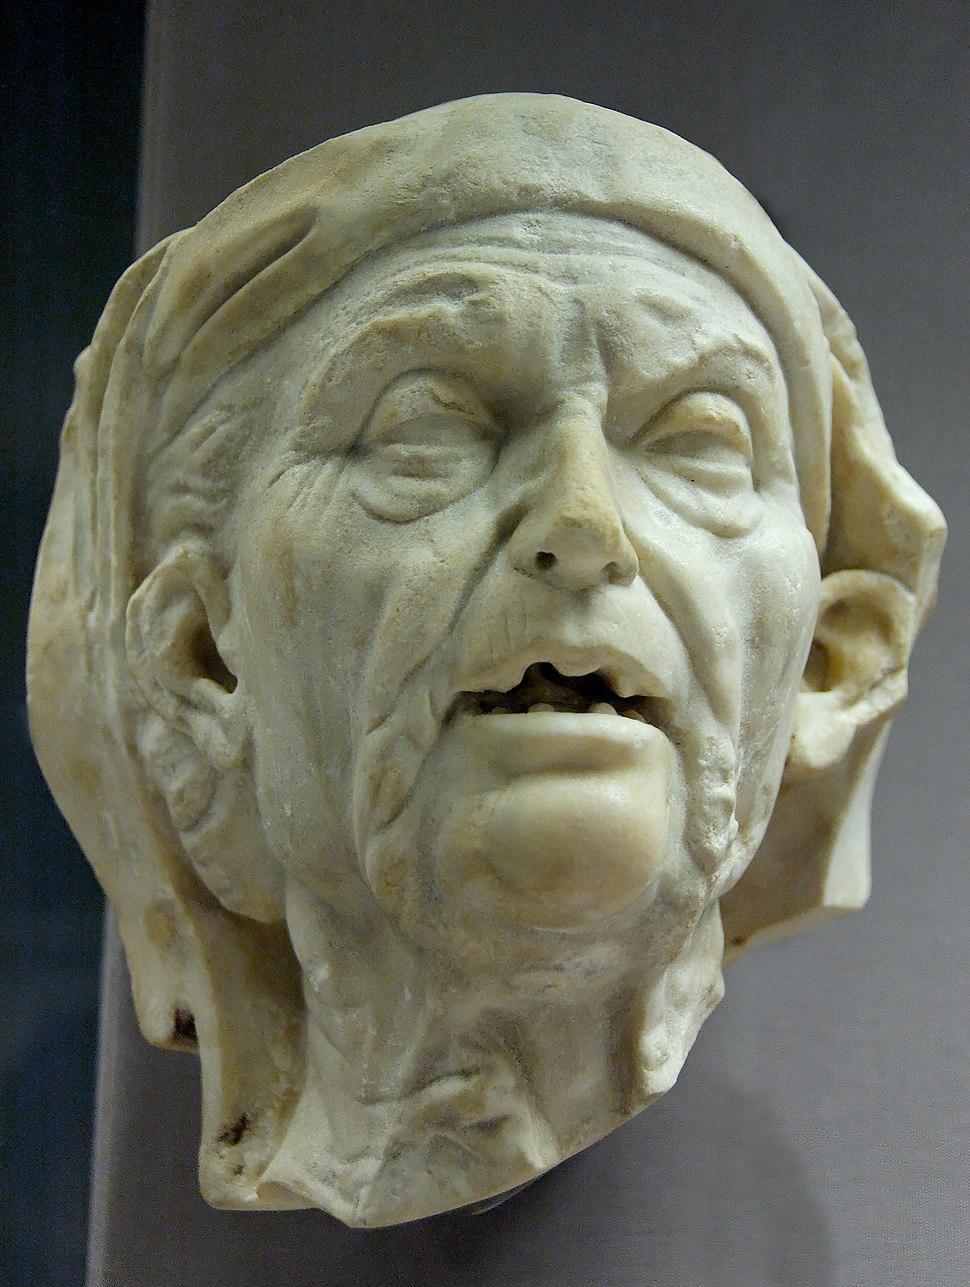 Old woman BM GR1852.3-27.9